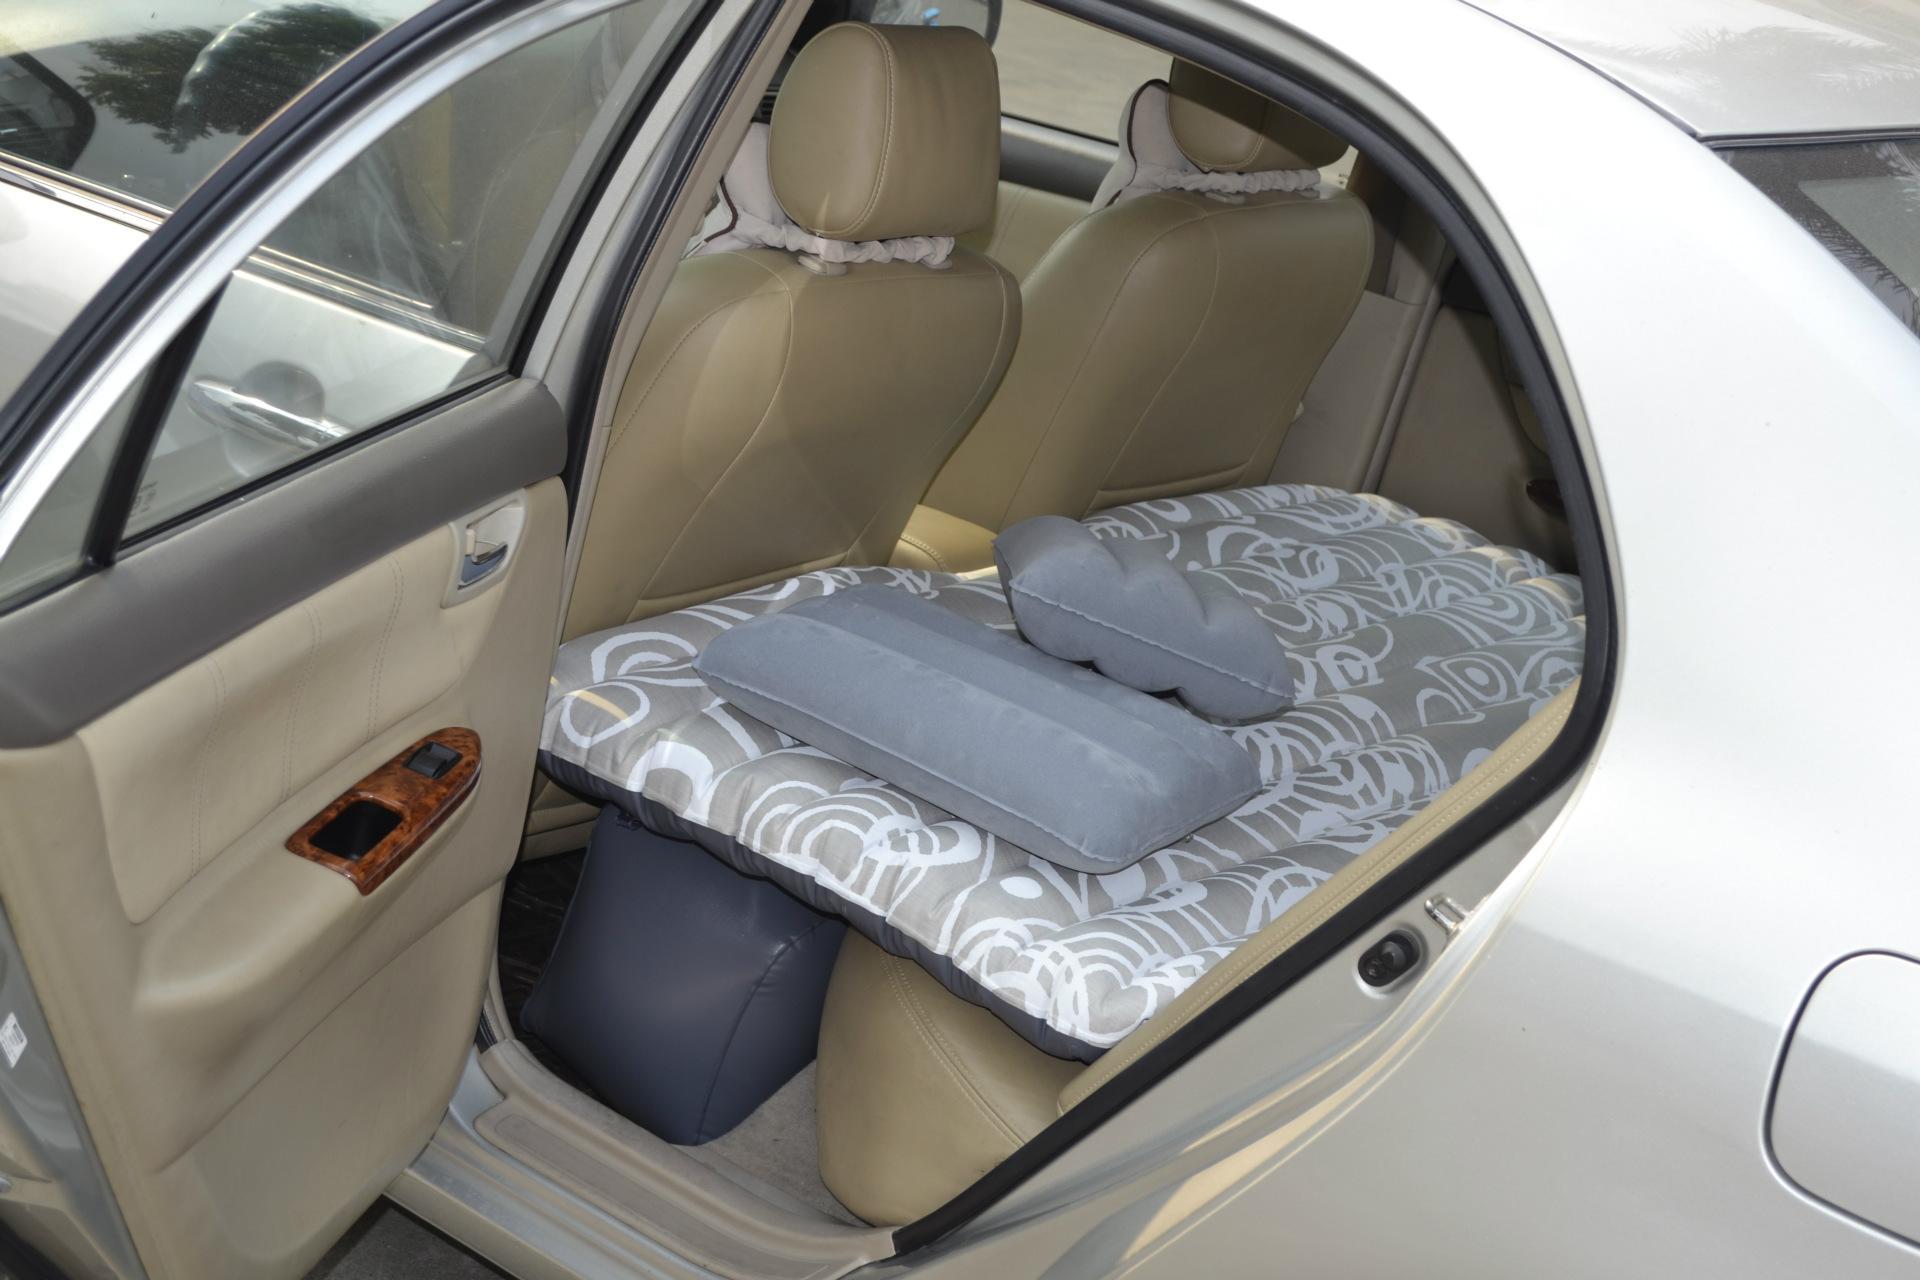 Arka Koltuk Yatağı Araba Arka Koltuk Minderi